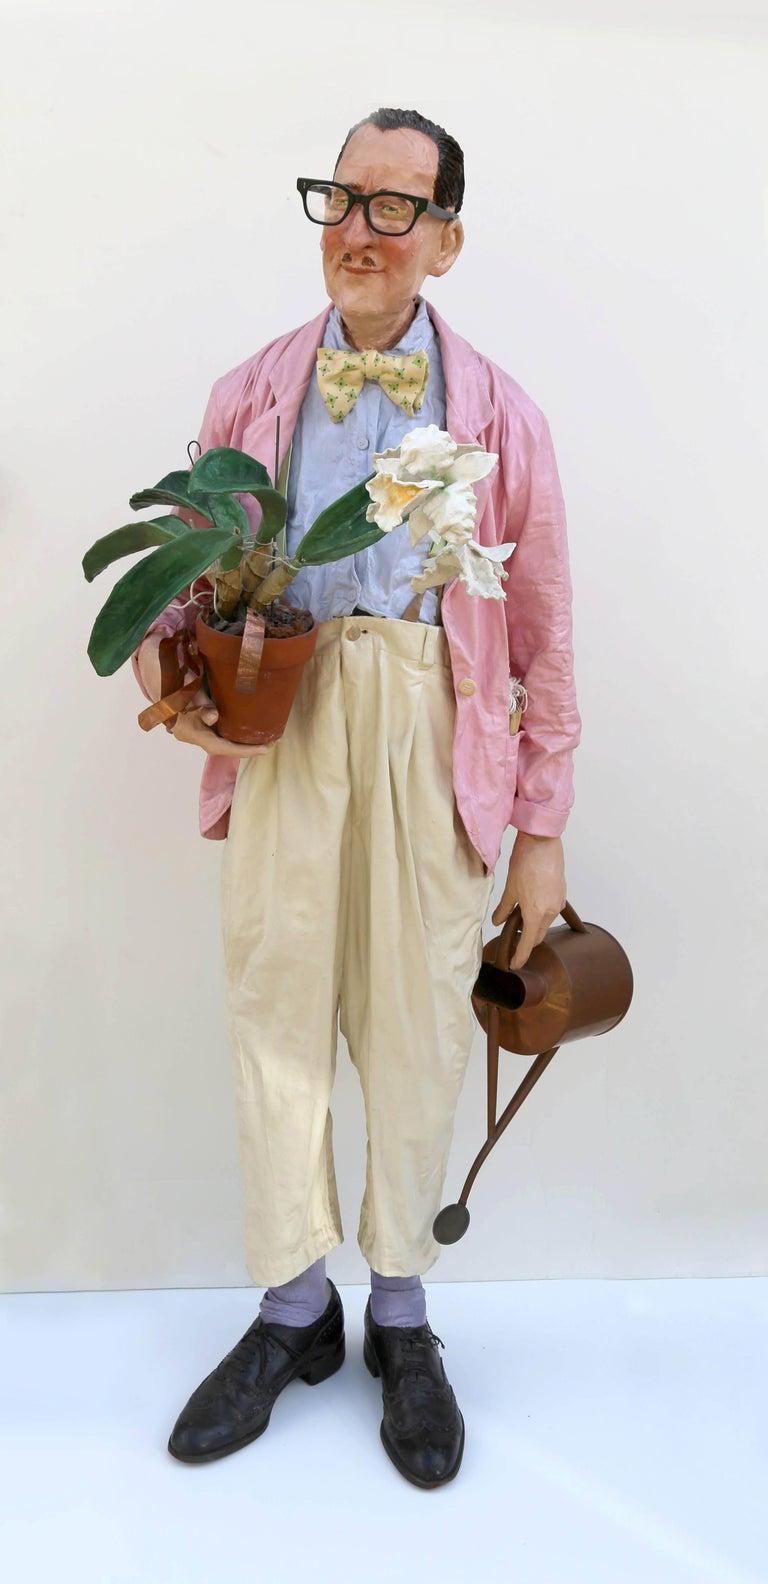 Artist: Kay Ritter Title: Florist Medium: Papier-mache with metal watering can, glasses, papier-mache flowers Year: 1995 Size: 57  x 24  x 14 in. (144.78  x 60.96  x 35.56 cm)